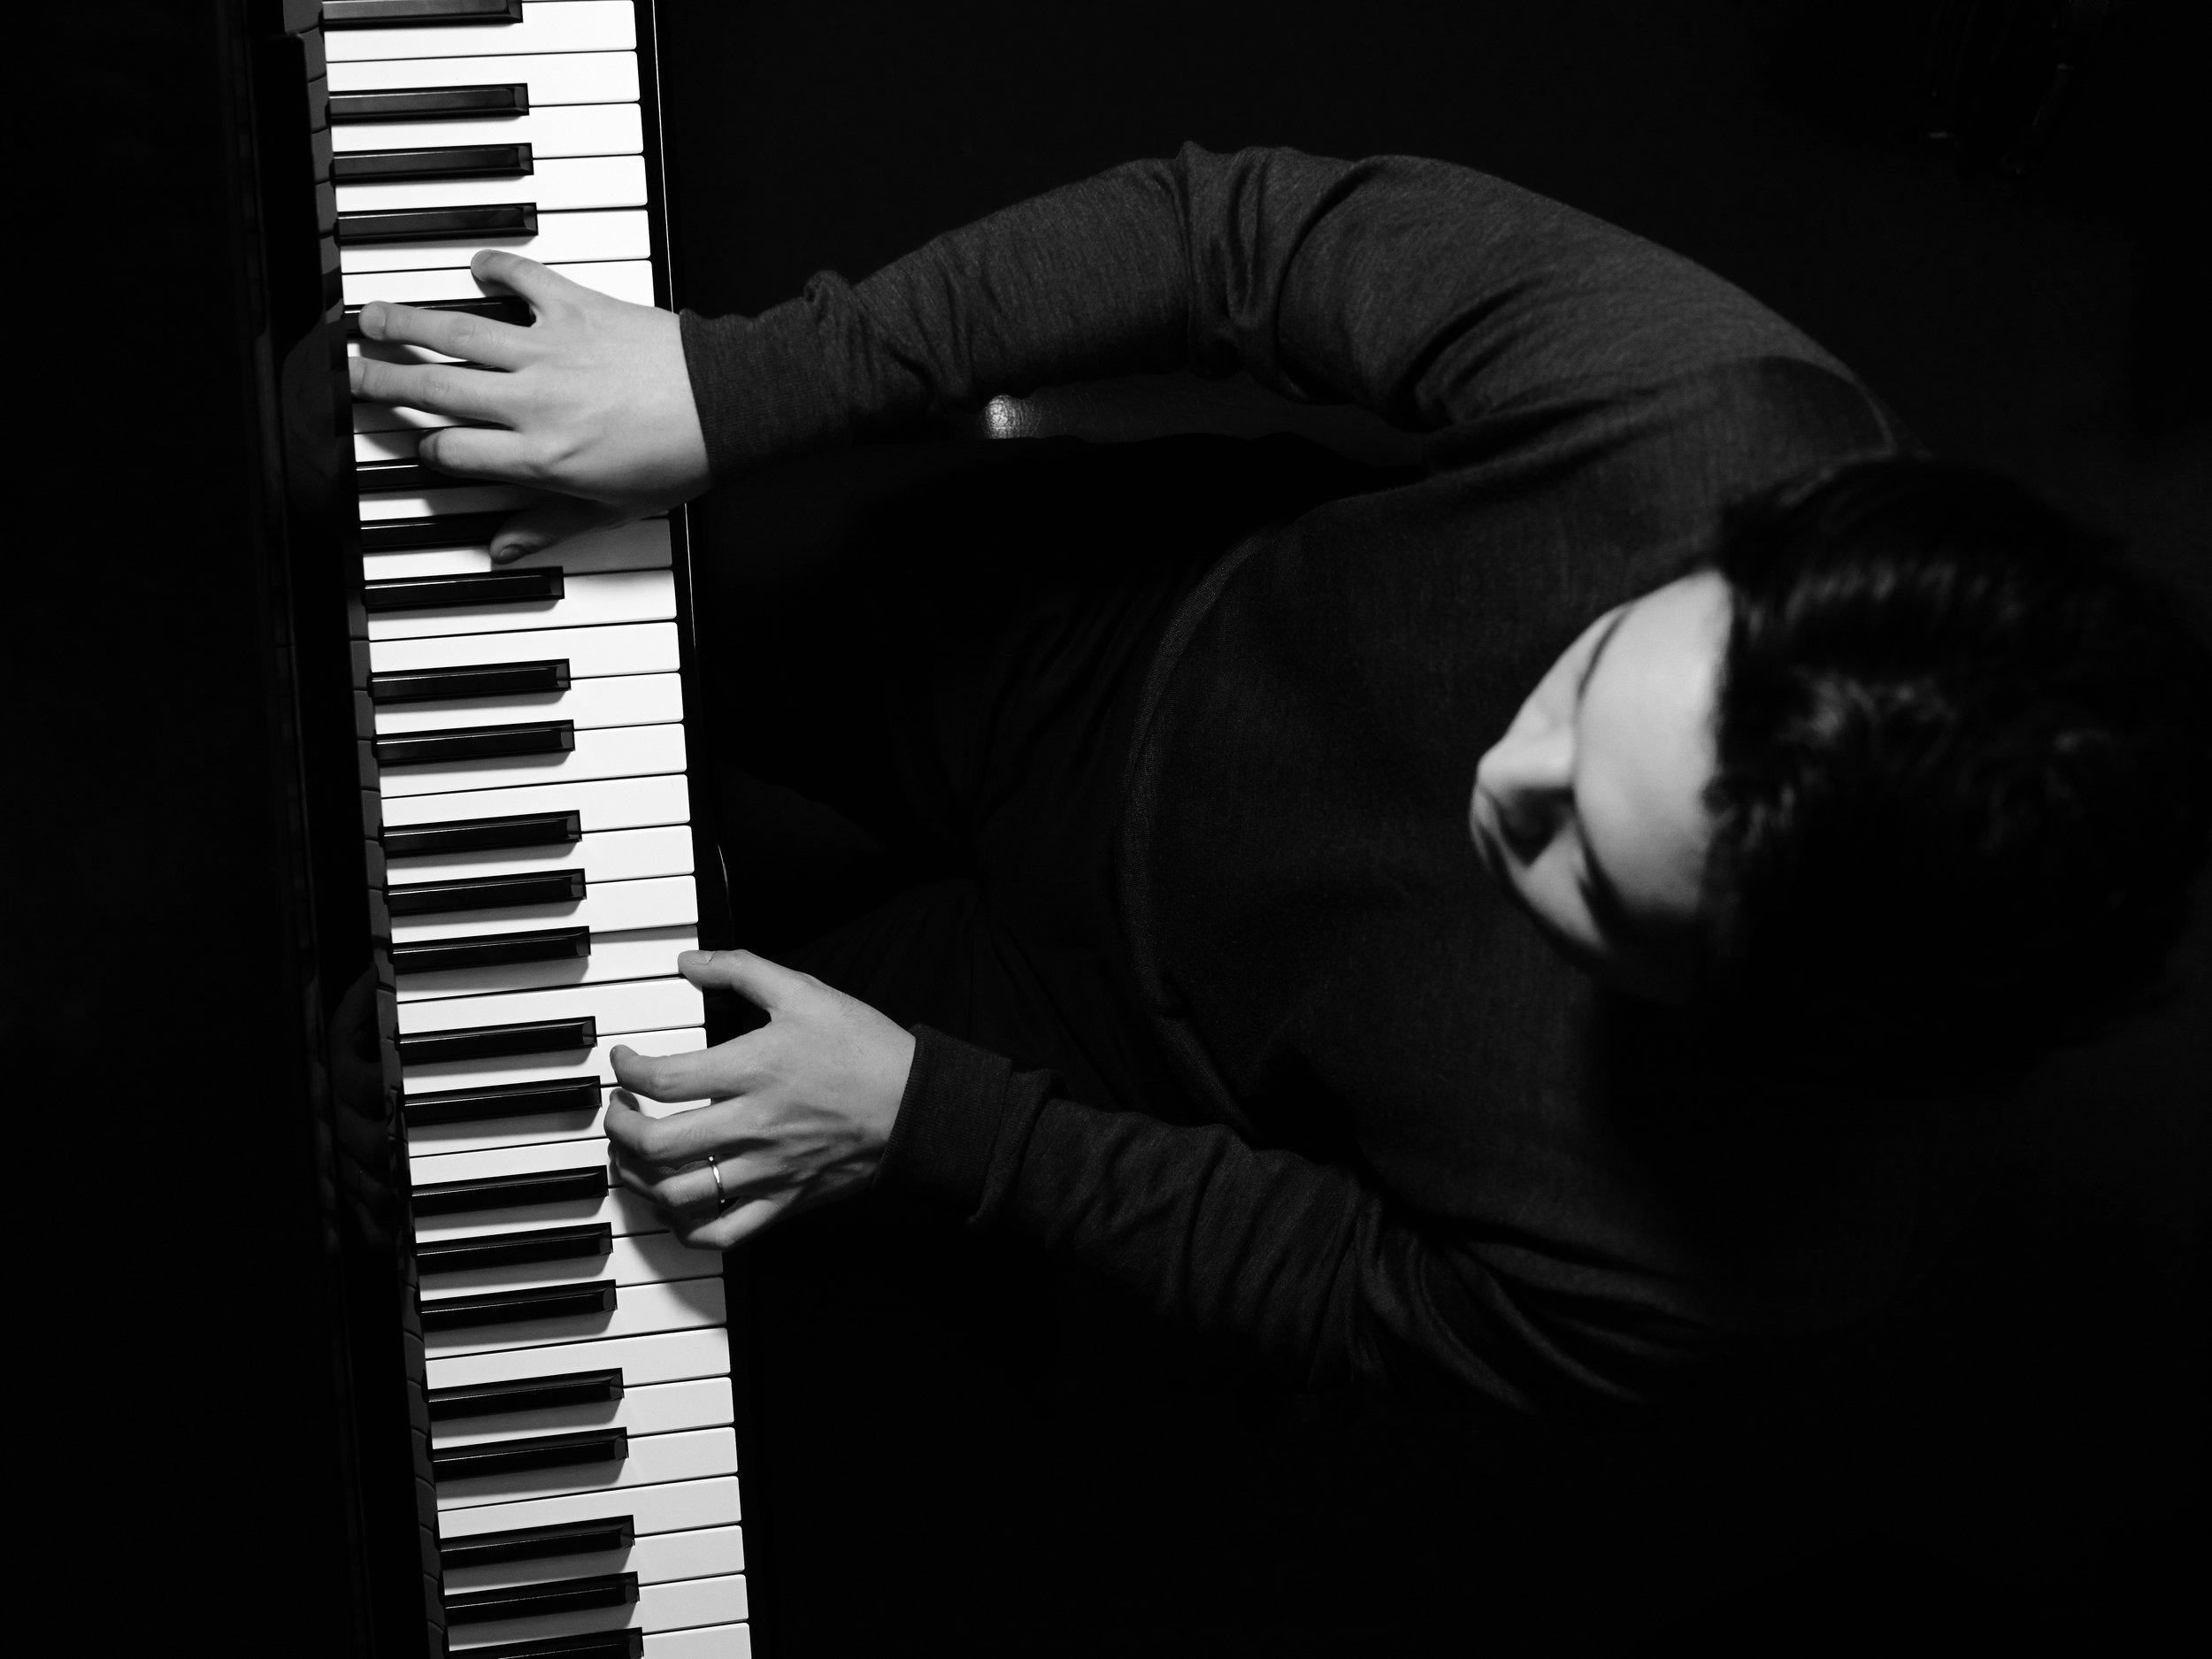 - SUNWOOK KIMMozart/Beethoven/Debussy/ChopinMardi 22 Janvier 2019THEATRE DES CHAMPS-ELYSEES20 :00